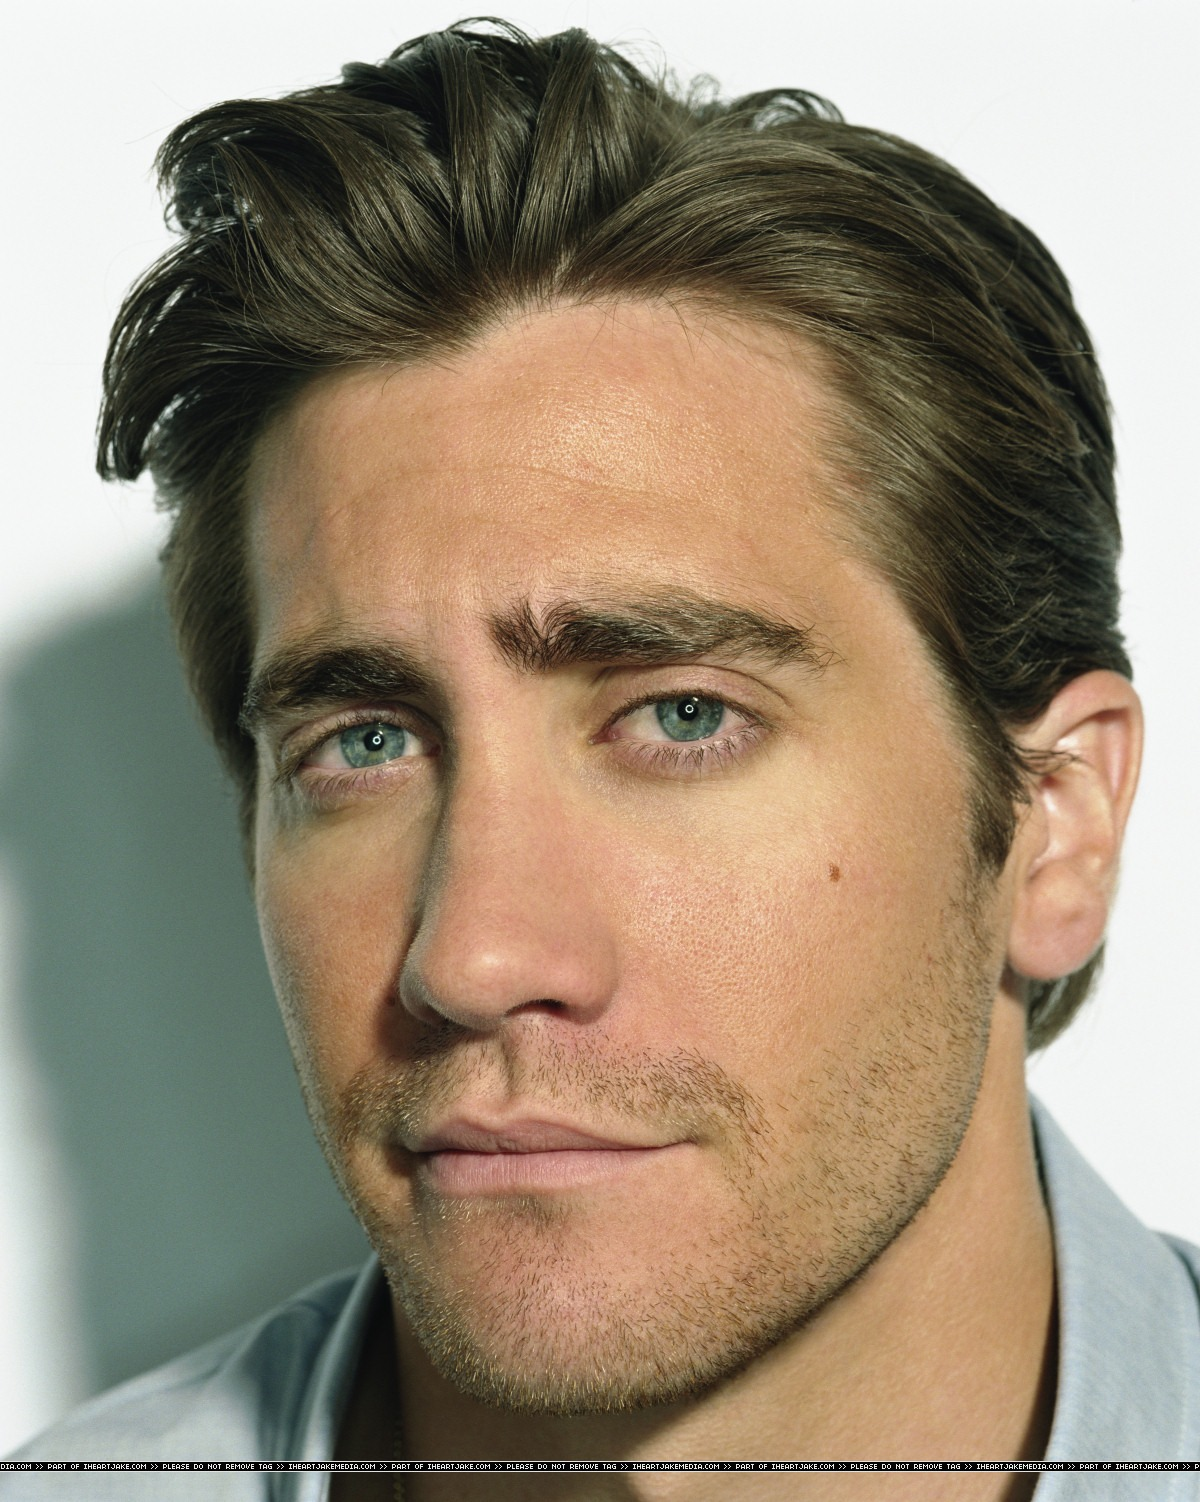 Jake Gyllenhaal images Jake HD wallpaper and background ... Jake Gyllenhaal